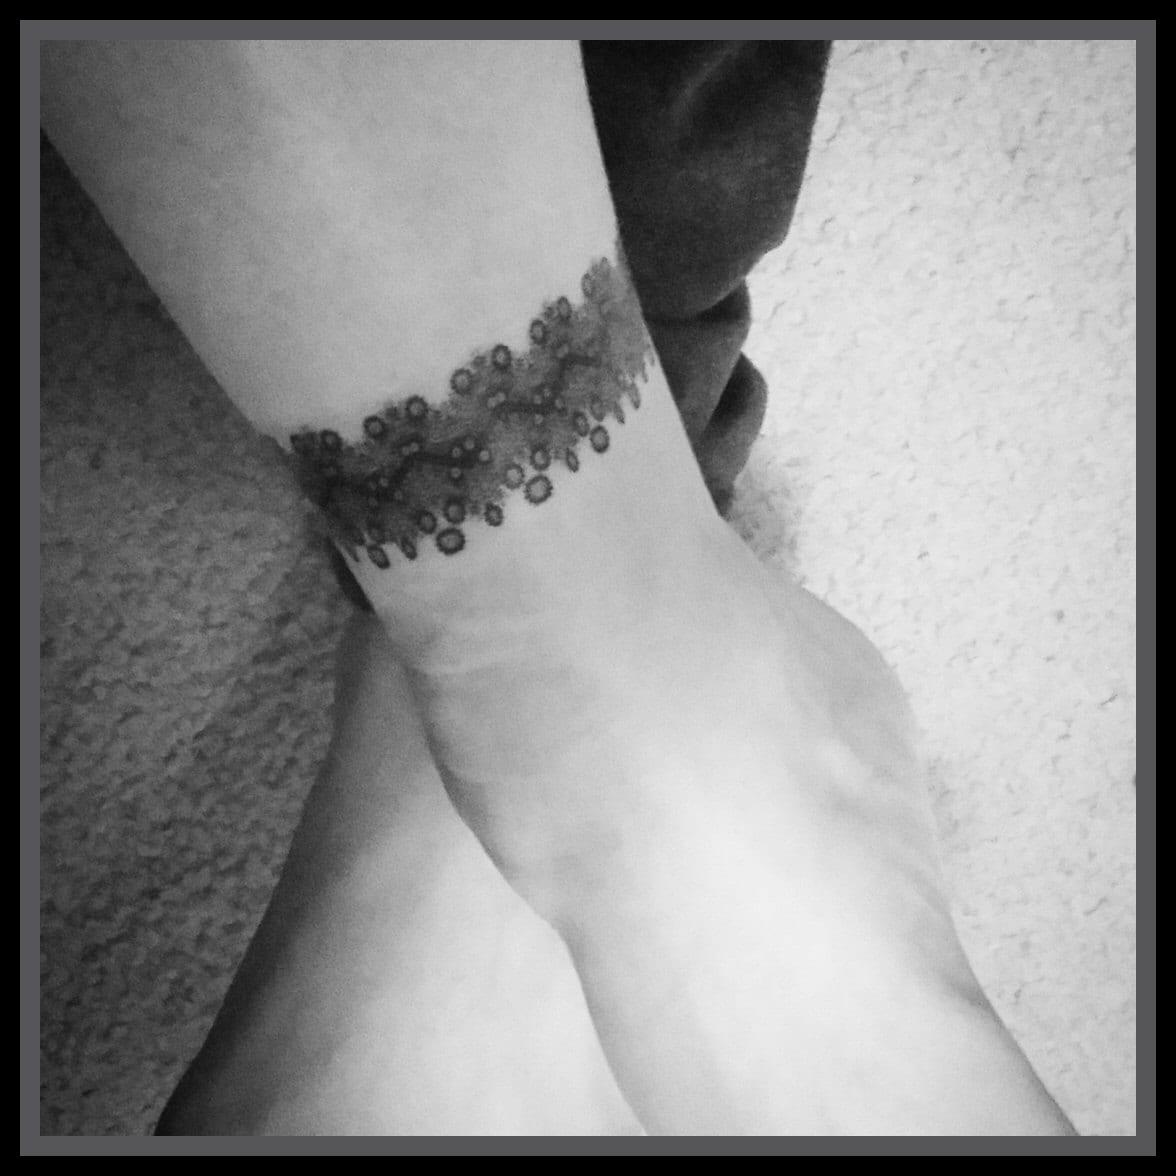 Temporary Tattoos Wrap Around Tattoos Lace Tattoos Ankle Etsy